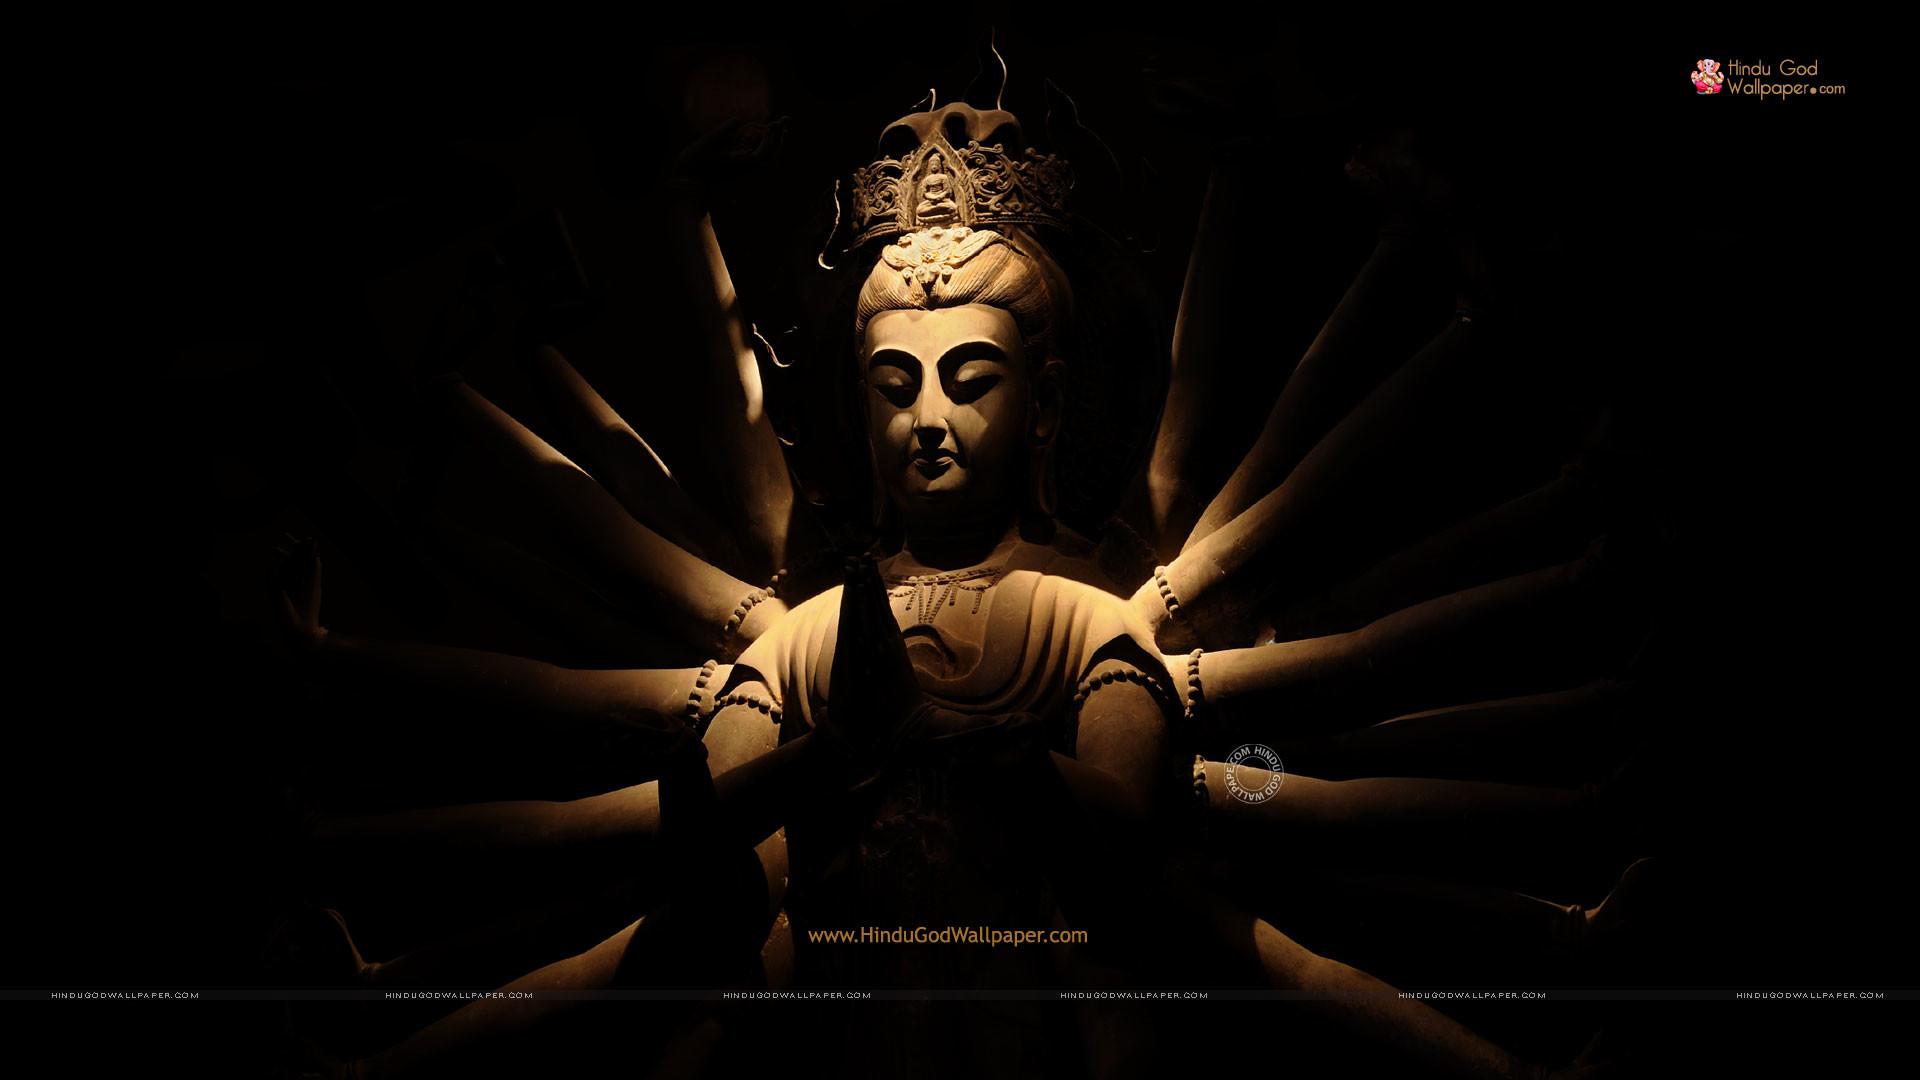 Tamil God Images Hd Hindu God Hd Wallpaper Photos Download